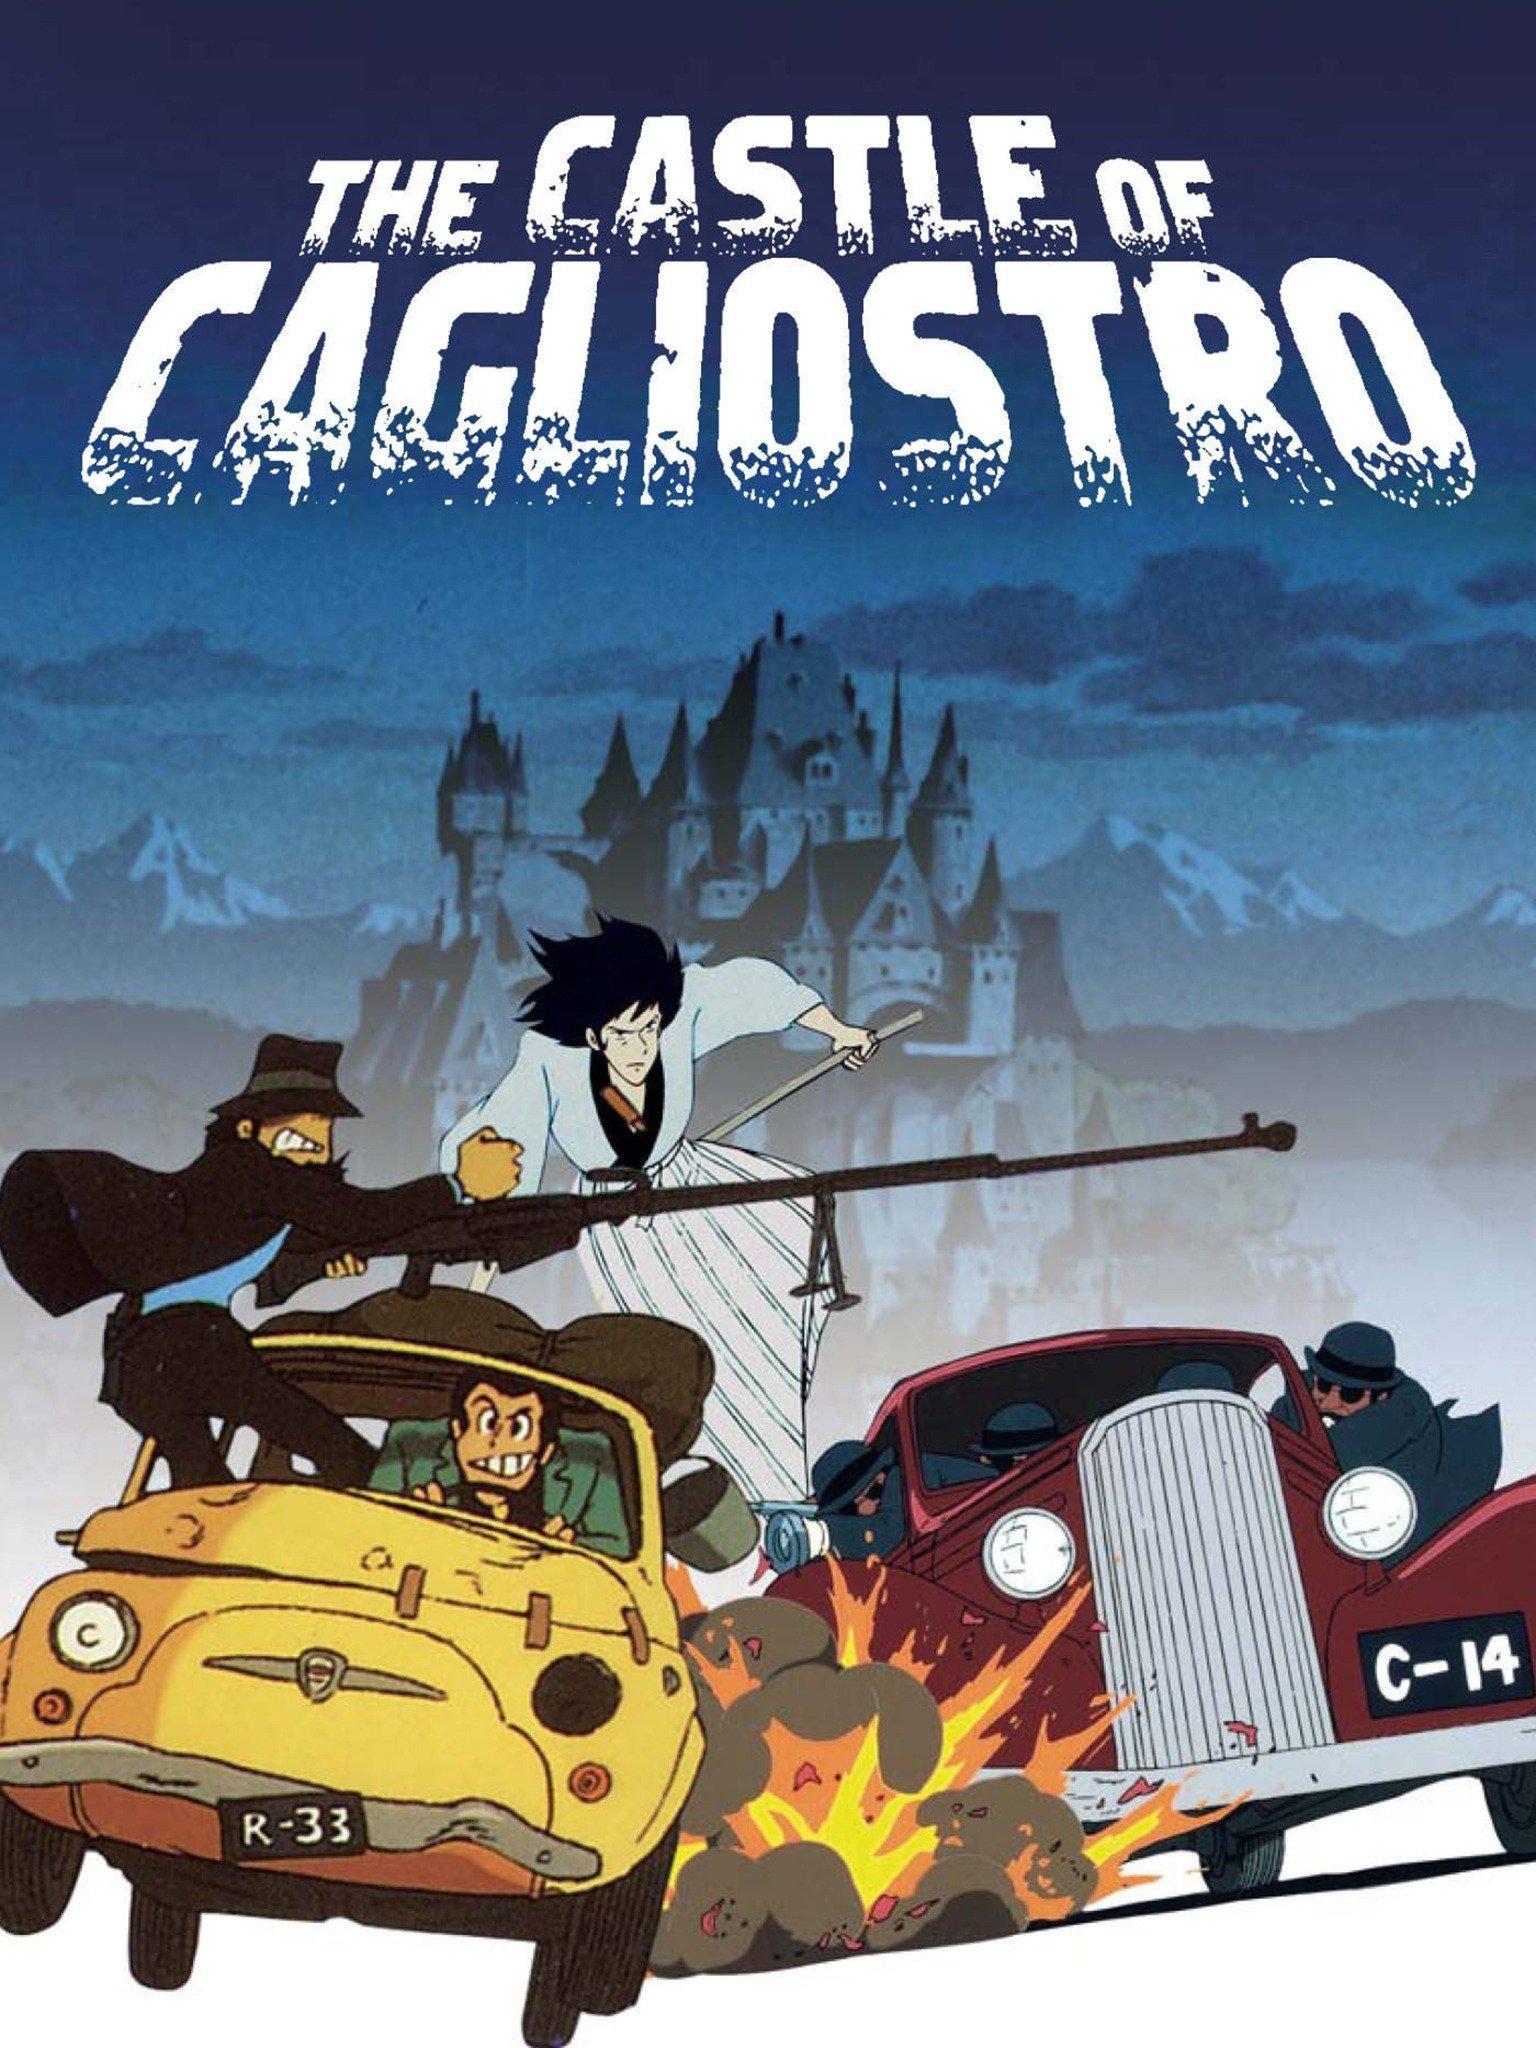 Lupin III: The Castle of Cagliostro (Rupan sansei: Kariosutoro no shiro)